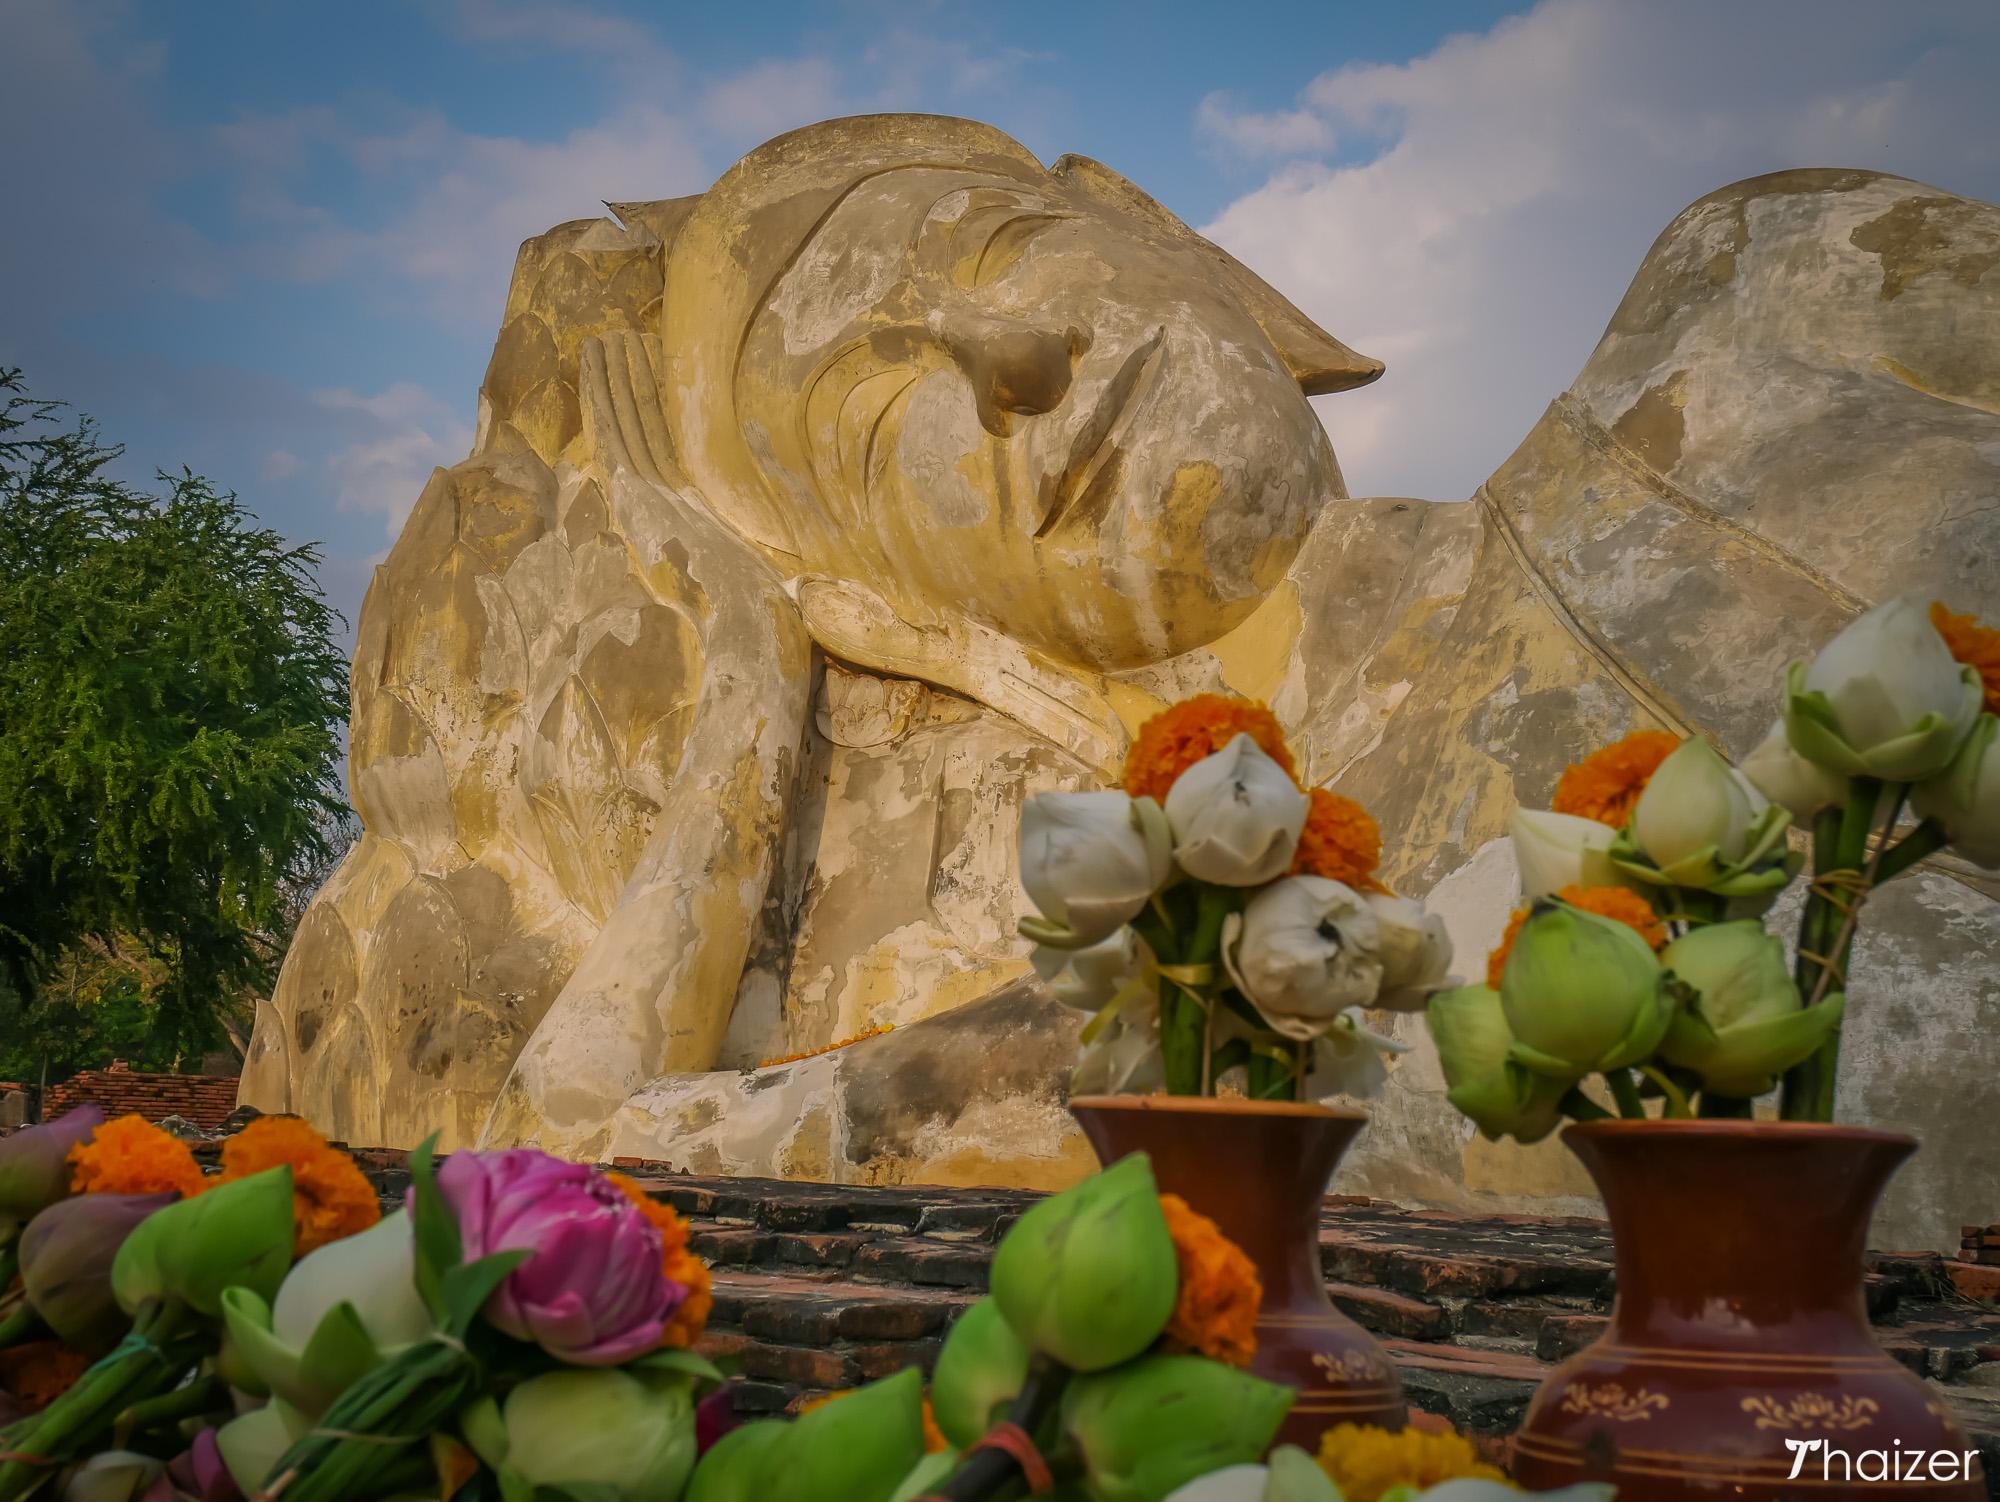 Reclining Buddha statue at Wat Lokayasutharam, Ayutthaya